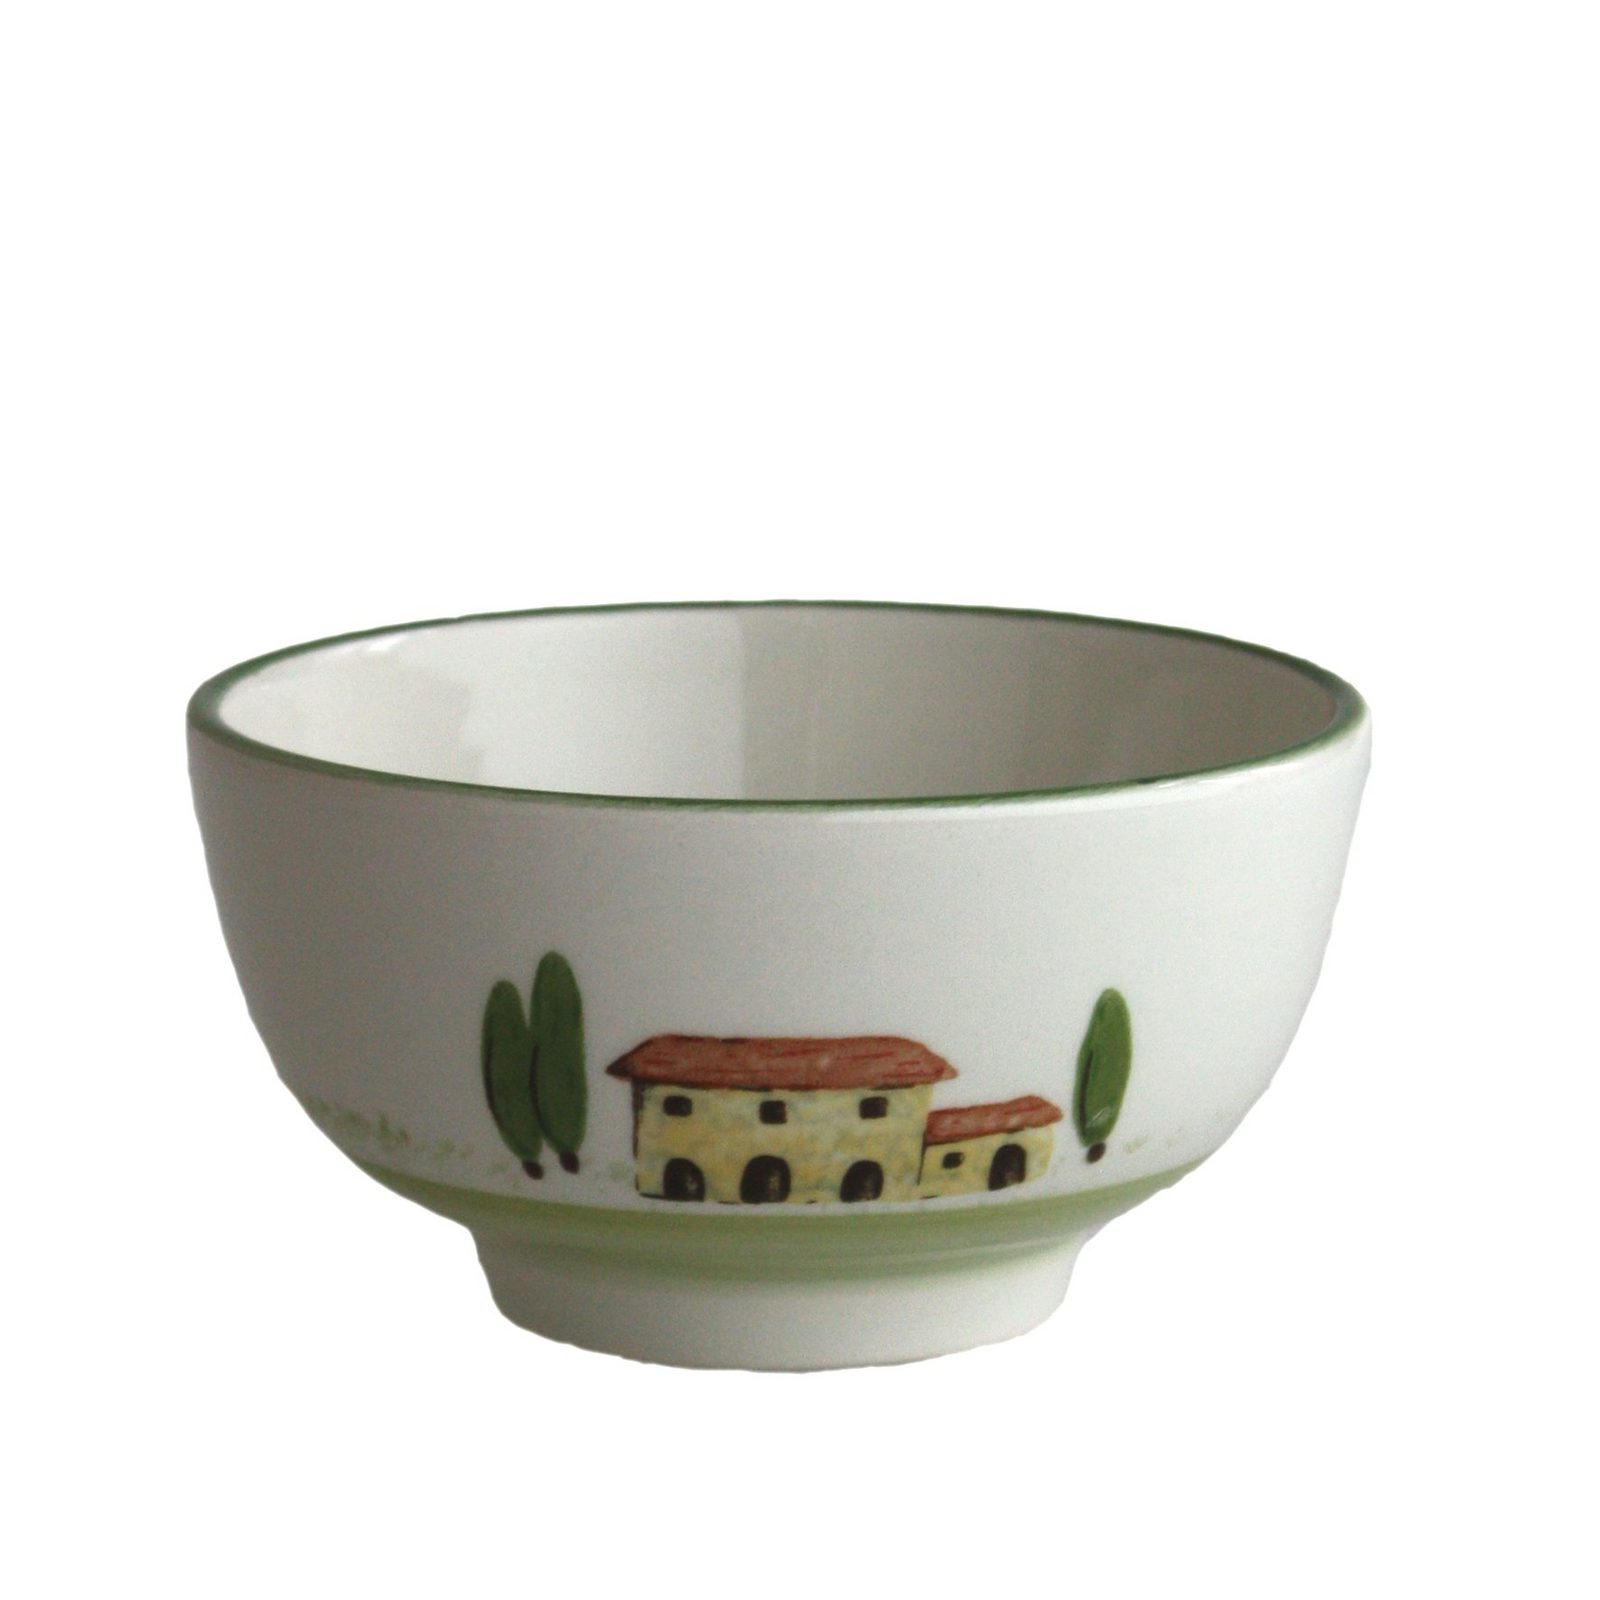 Zeller Keramik Schälchen »Bella Toscana« - broschei